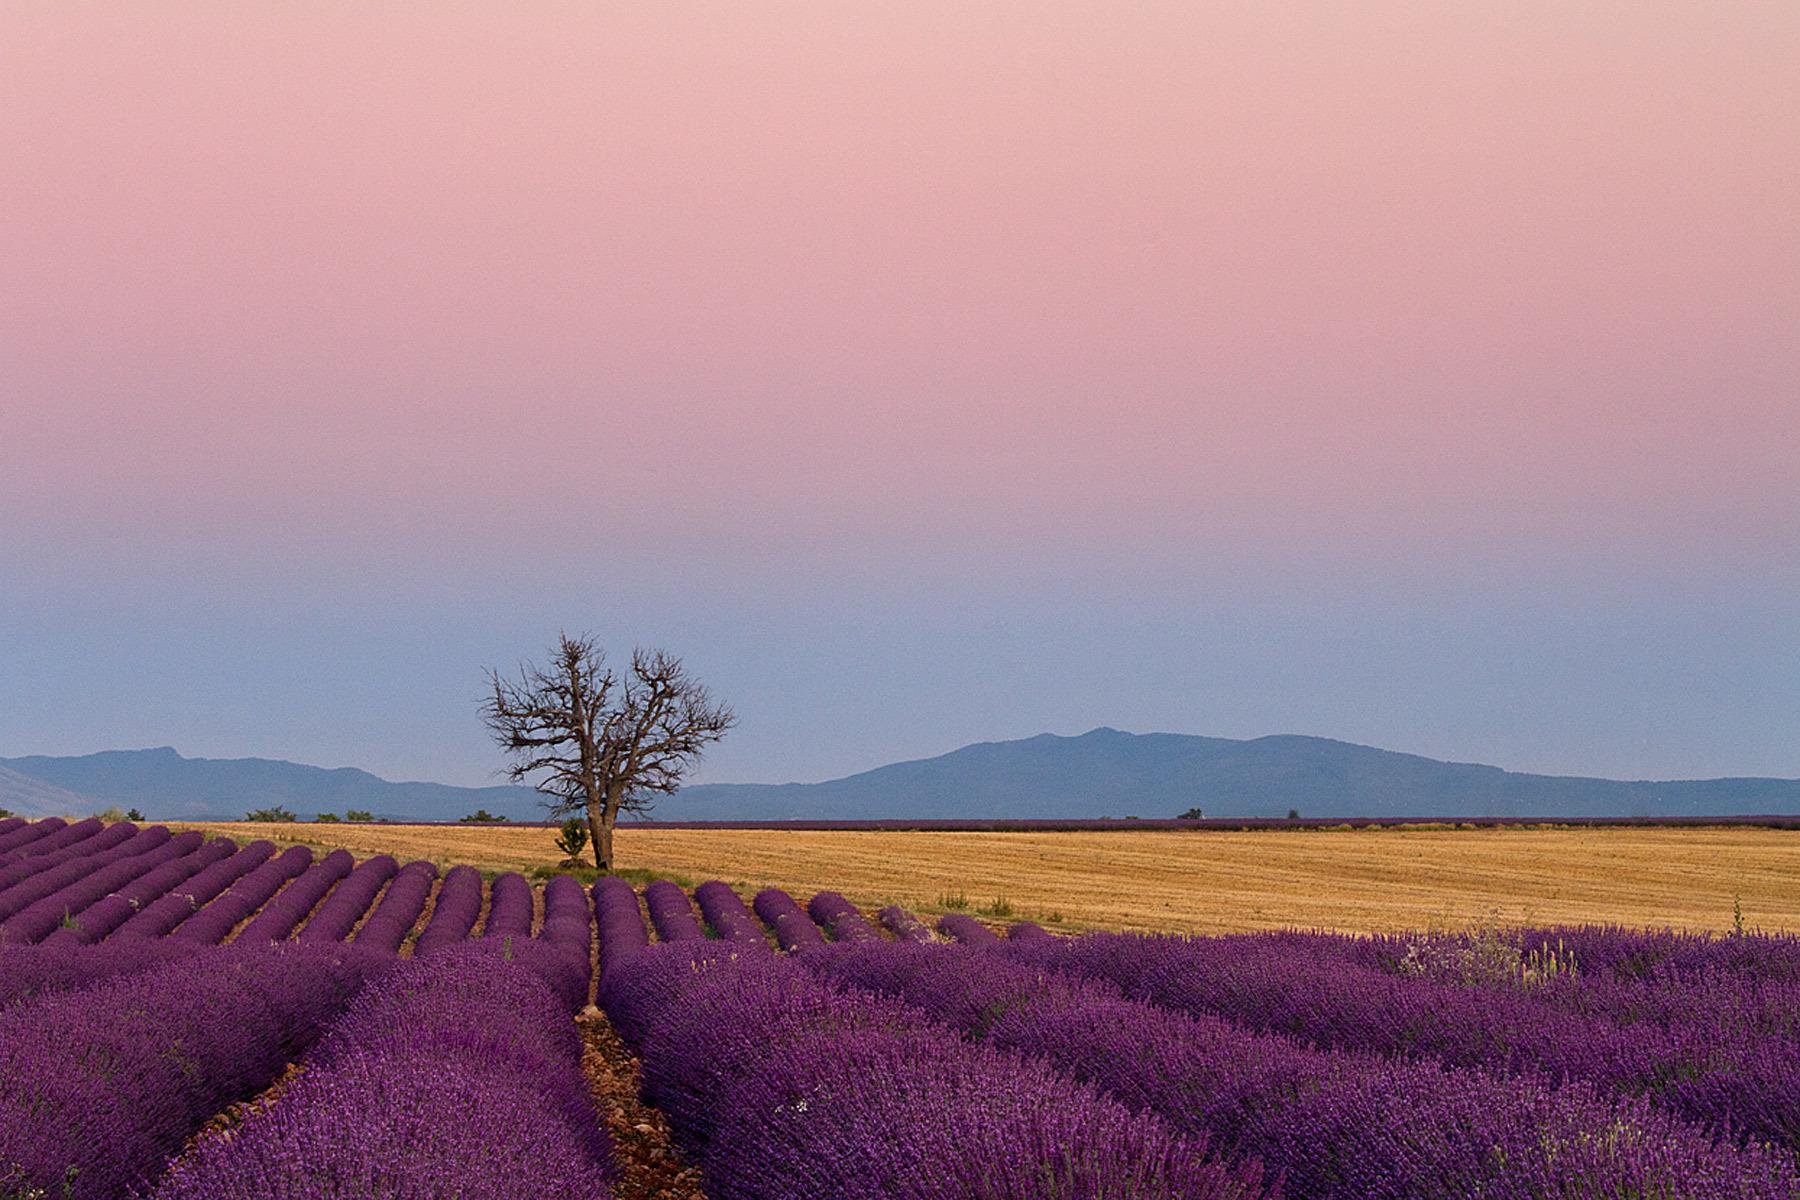 Evening Twilight - Valensole Plain - Provence - France